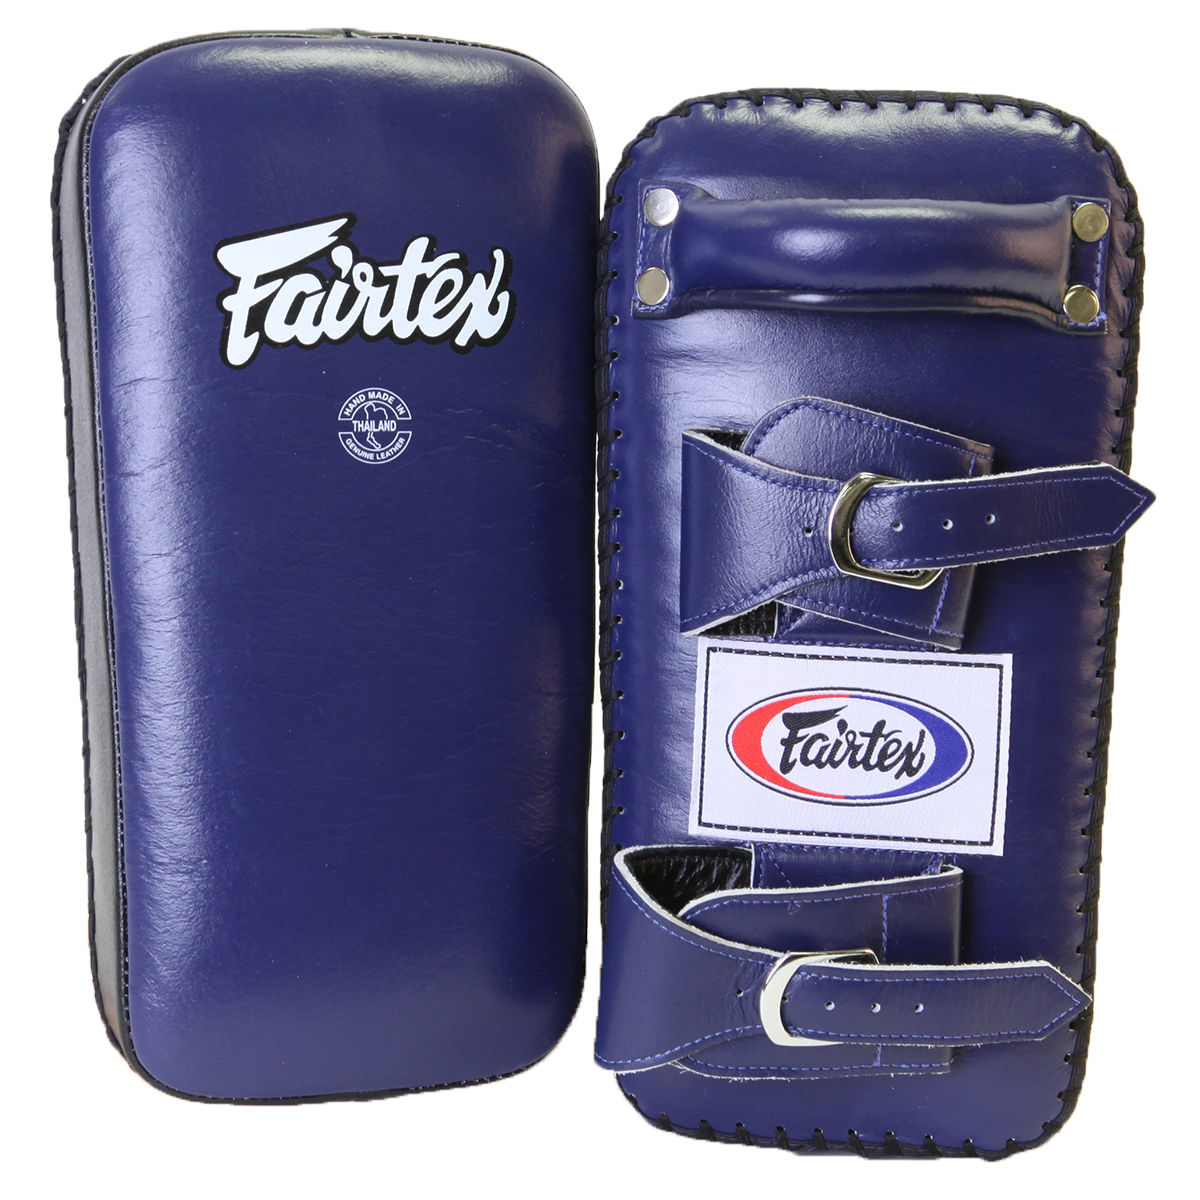 Fairtex Extra Thick Thai Kick Pads with Buckle - Blue/Black